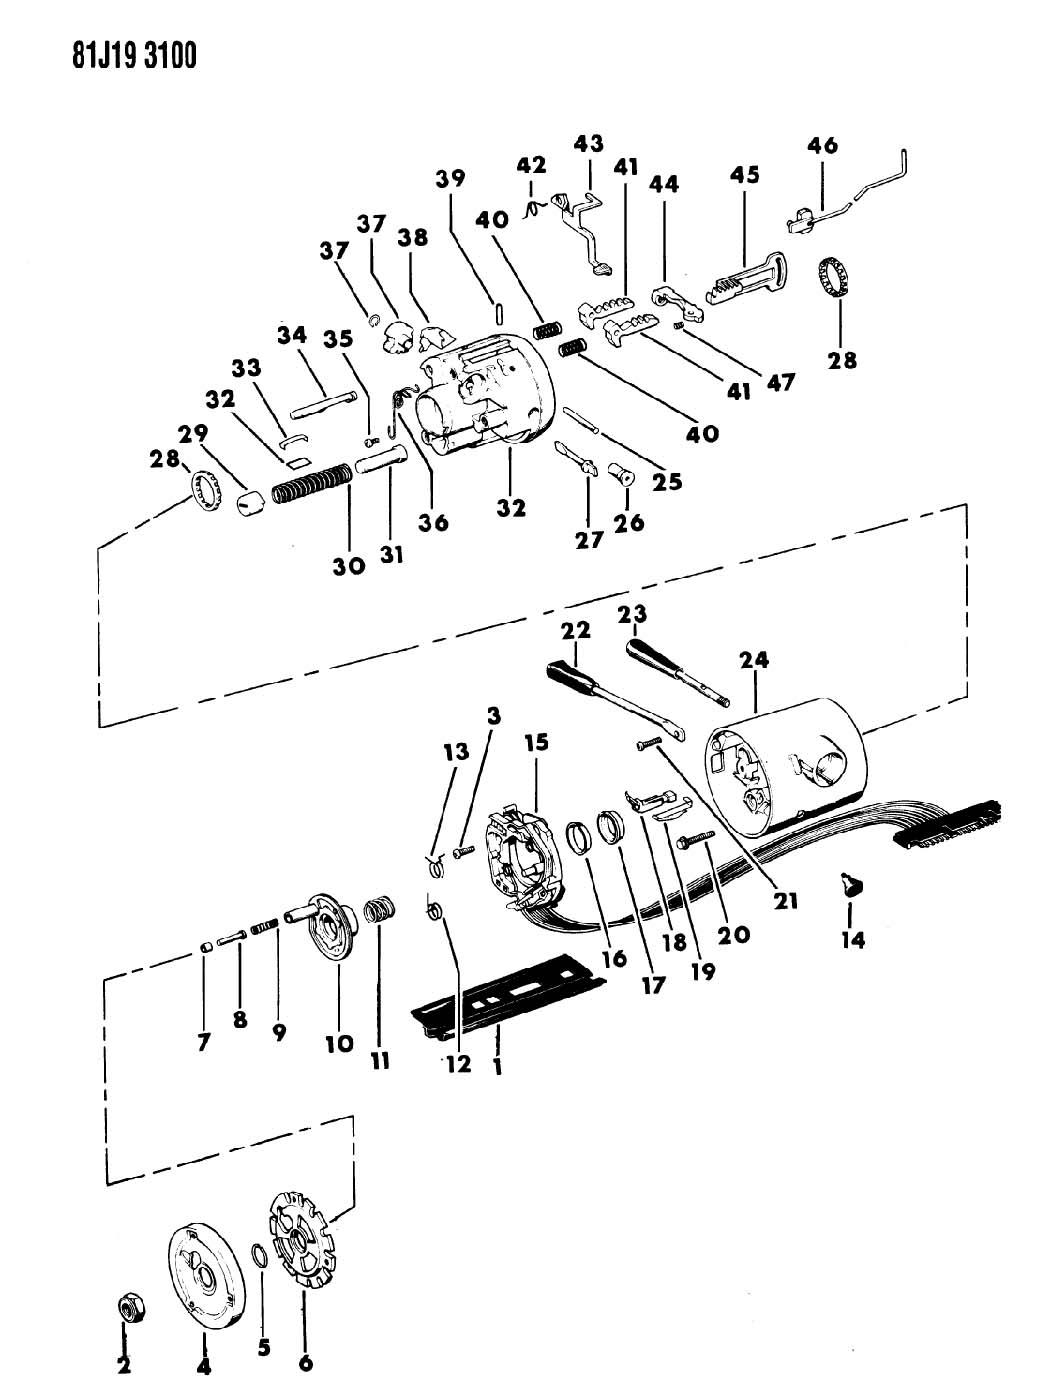 1987 Jeep Wrangler Pin, pin c. Wfloor, wcolumn, spoke